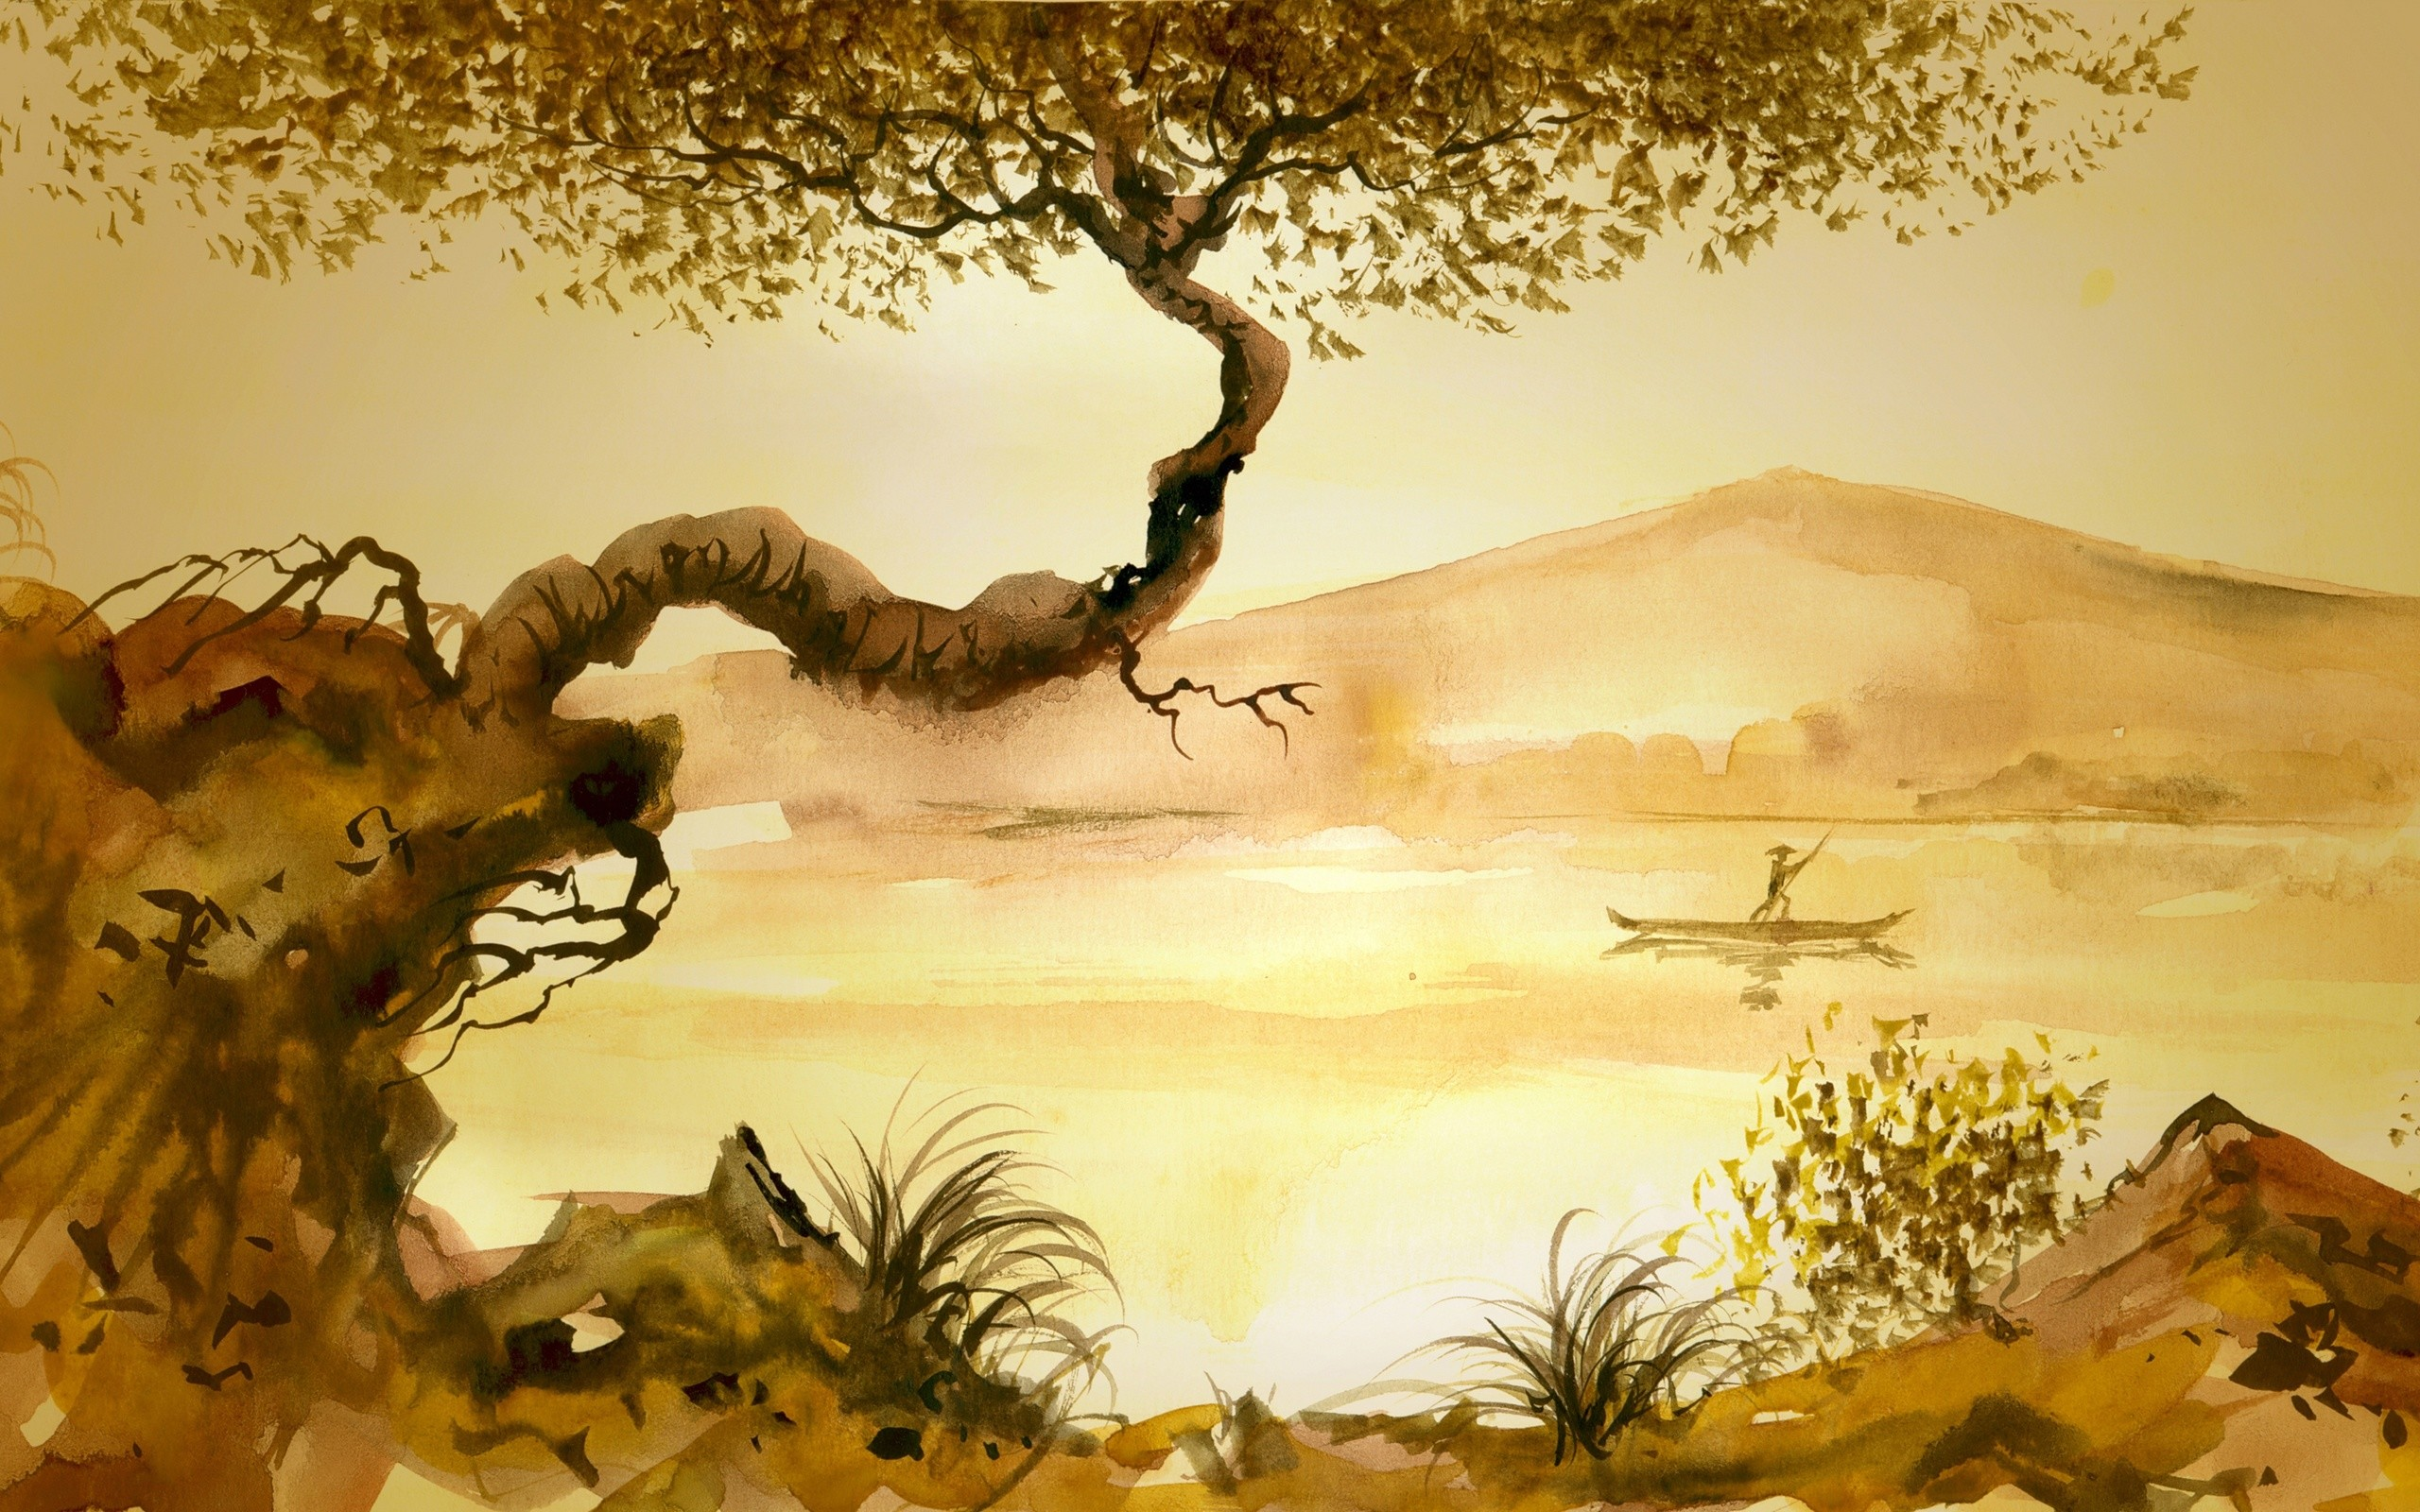 Junk man tree grass asian lake painting mood wallpaper     176941    WallpaperUP